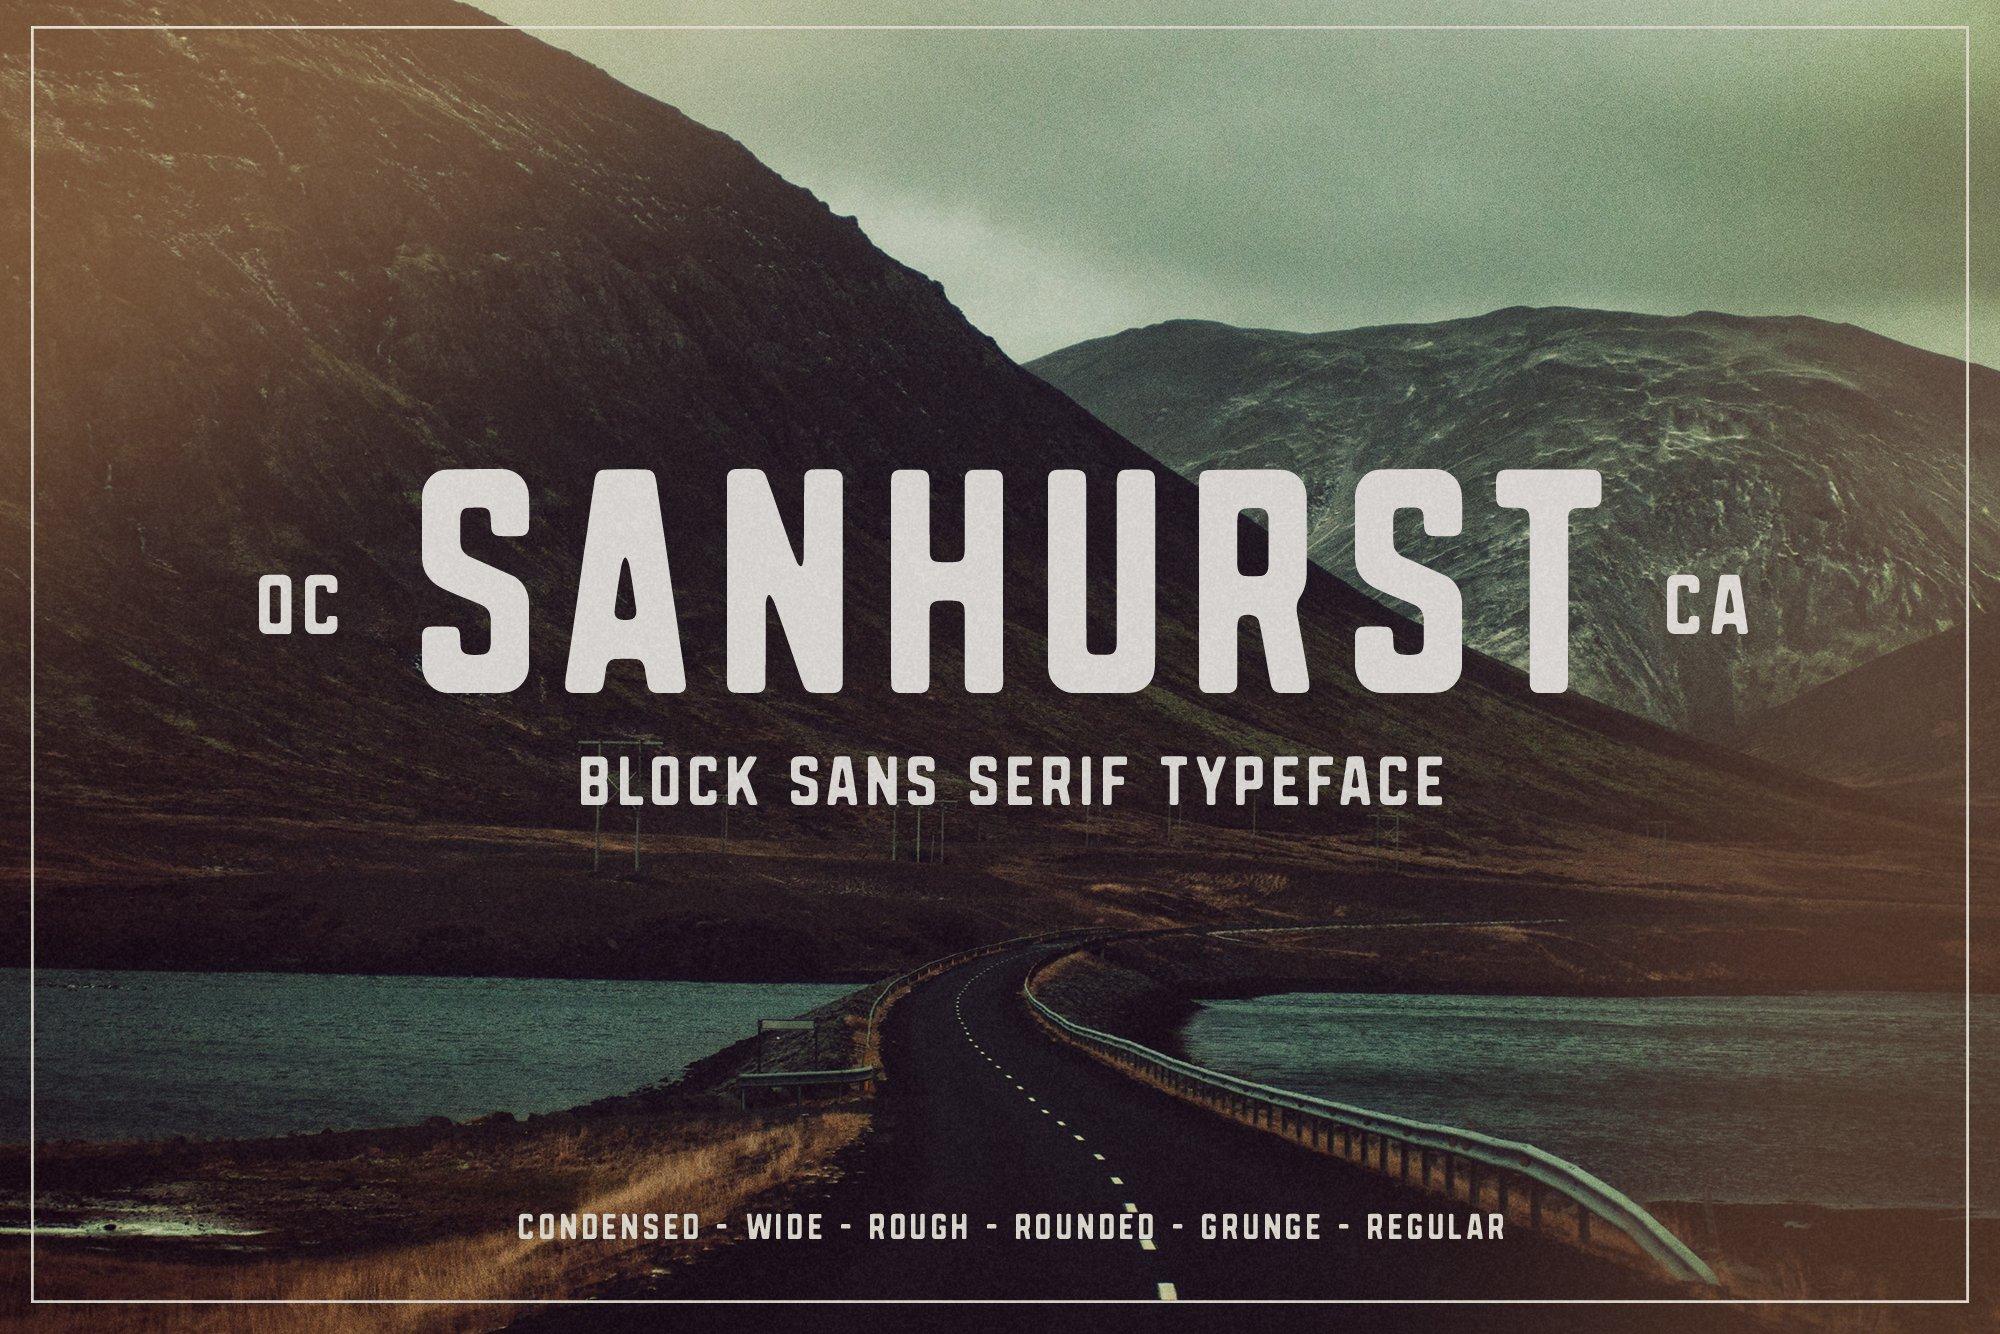 Sanhurst-Sans-Serif-Font-www.mockuphill.com